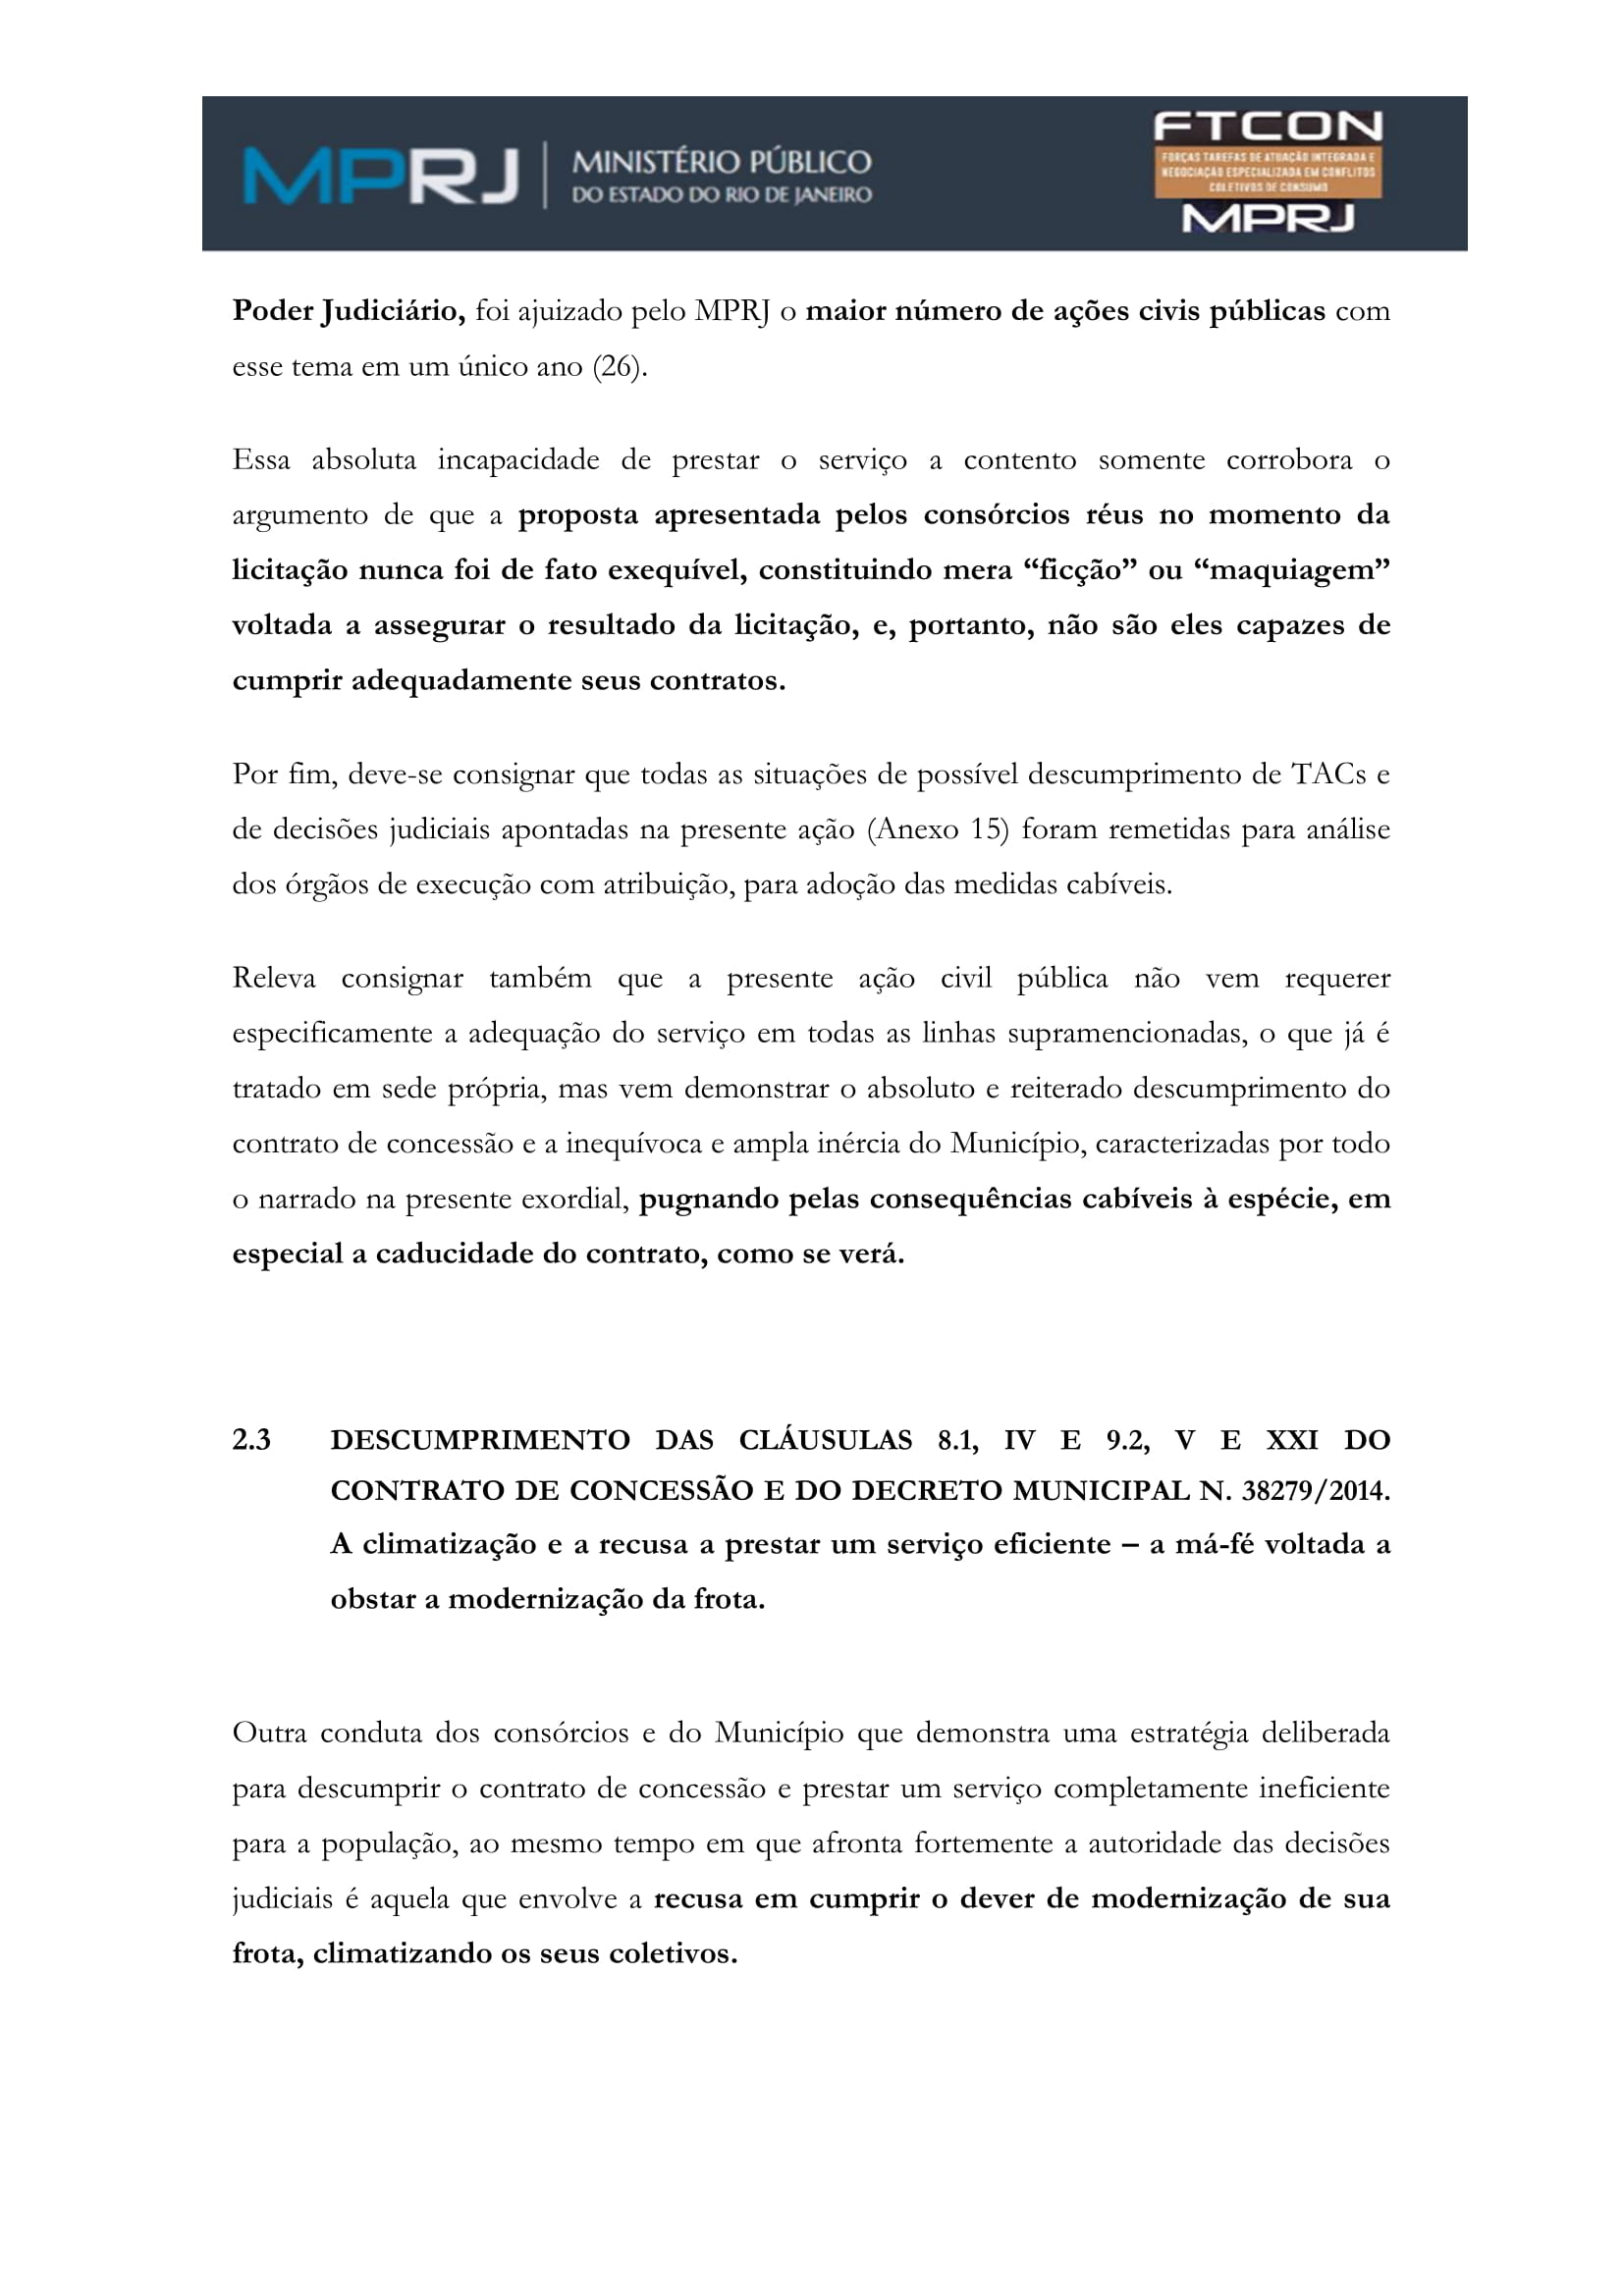 acp_caducidade_onibus_dr_rt-037